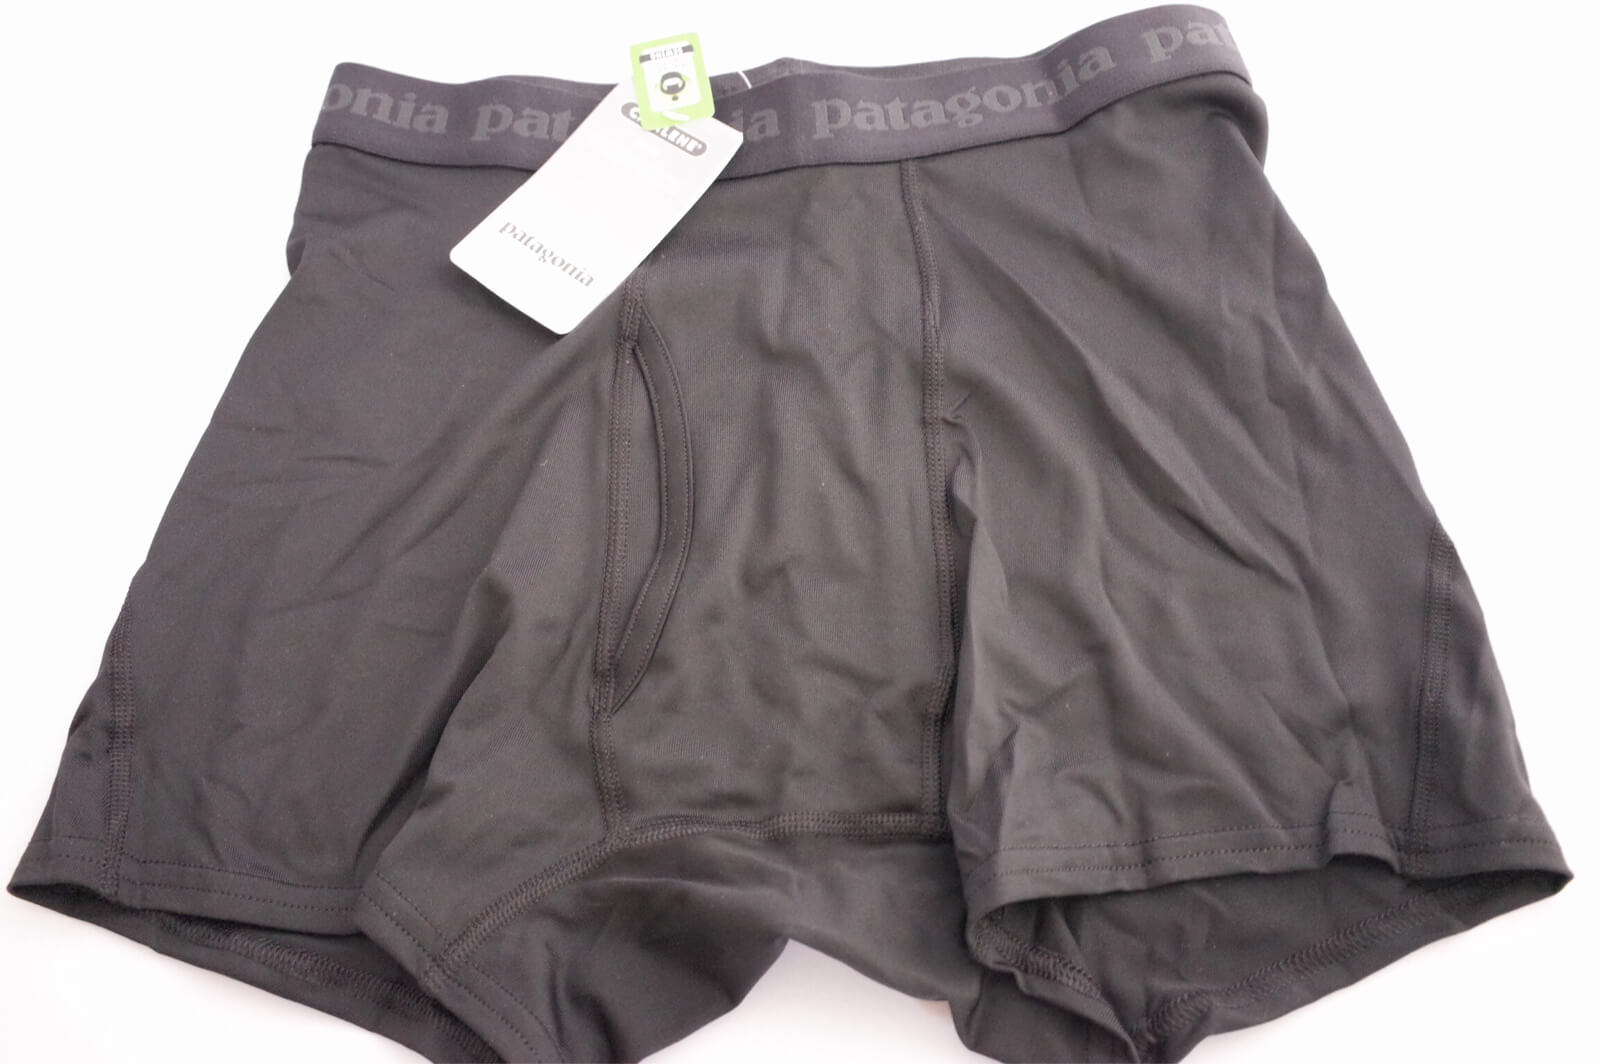 capilene daily boxer briefs パンツ パタゴニア 速乾